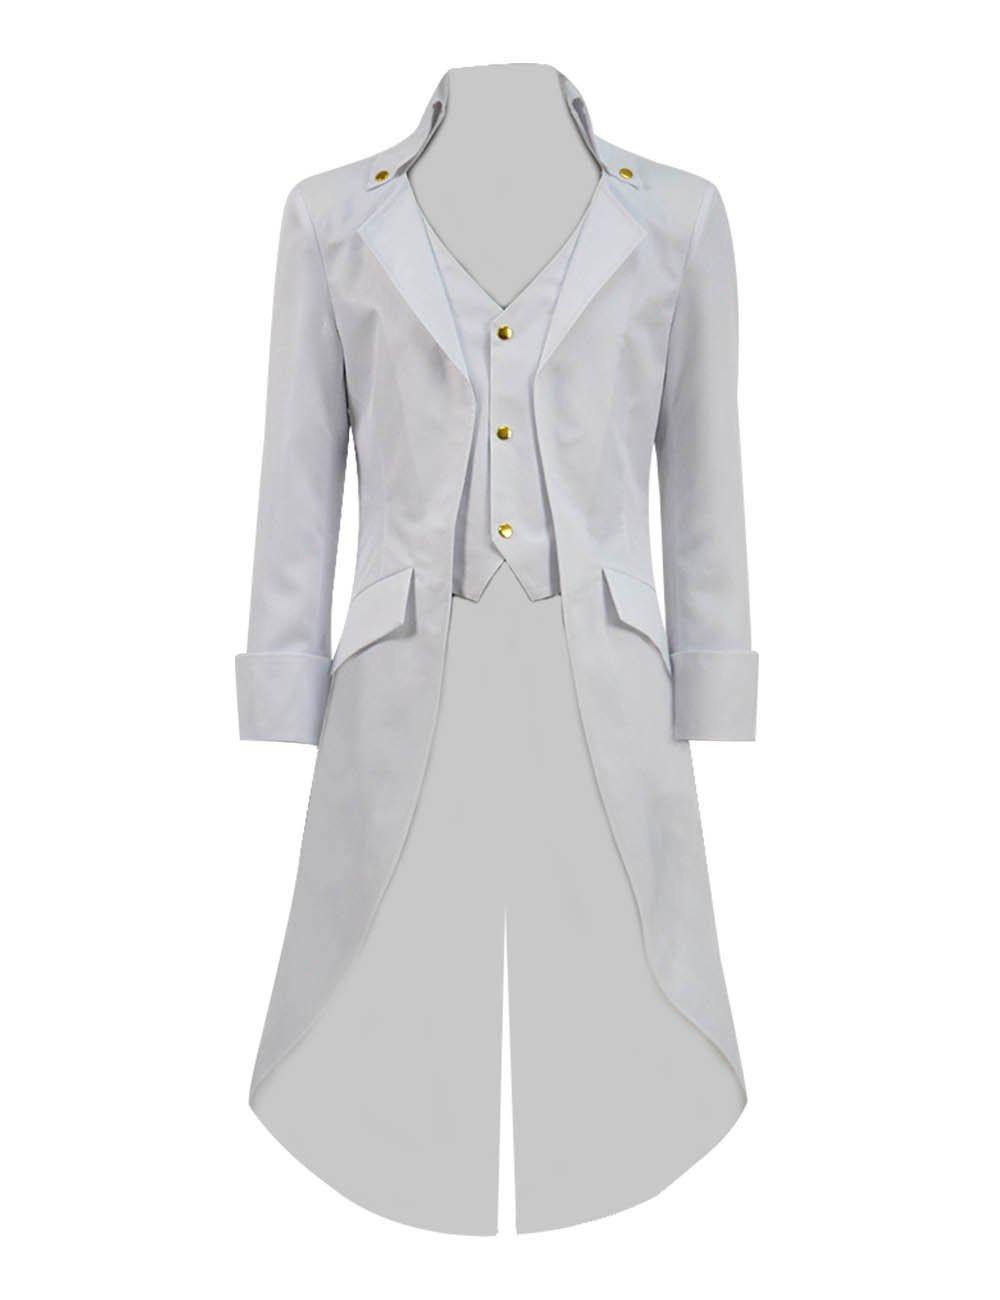 Very Last Shop Boys Gothic Tailcoat Jacket Black Steampunk Victorian Long Coat Vampire Costume (White, 8)